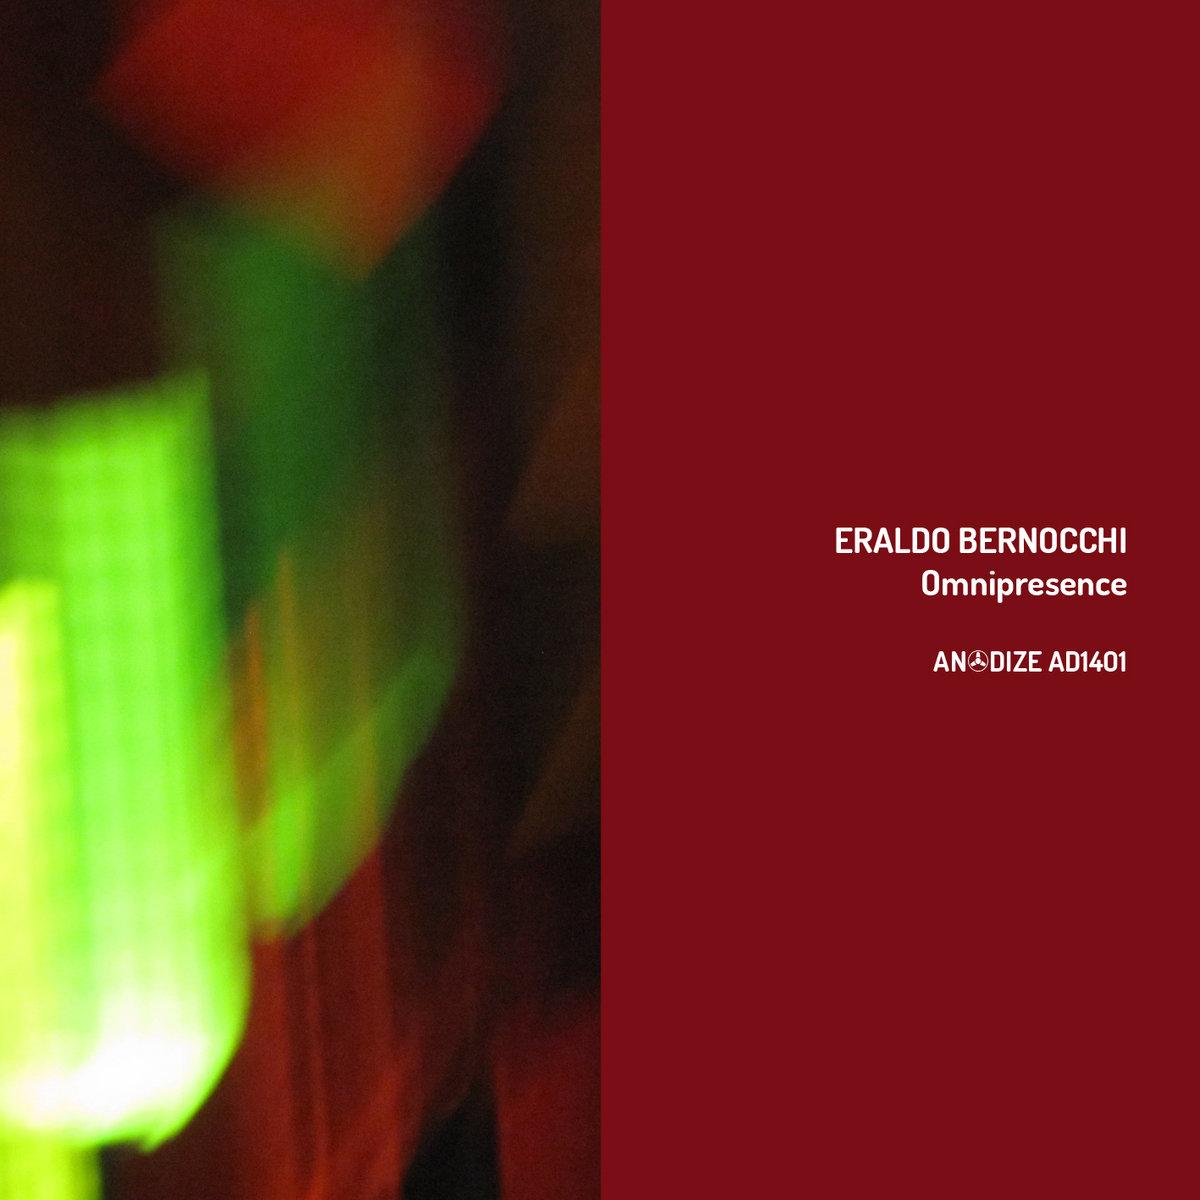 Omnipresence | Eraldo Bernocchi | Anodize